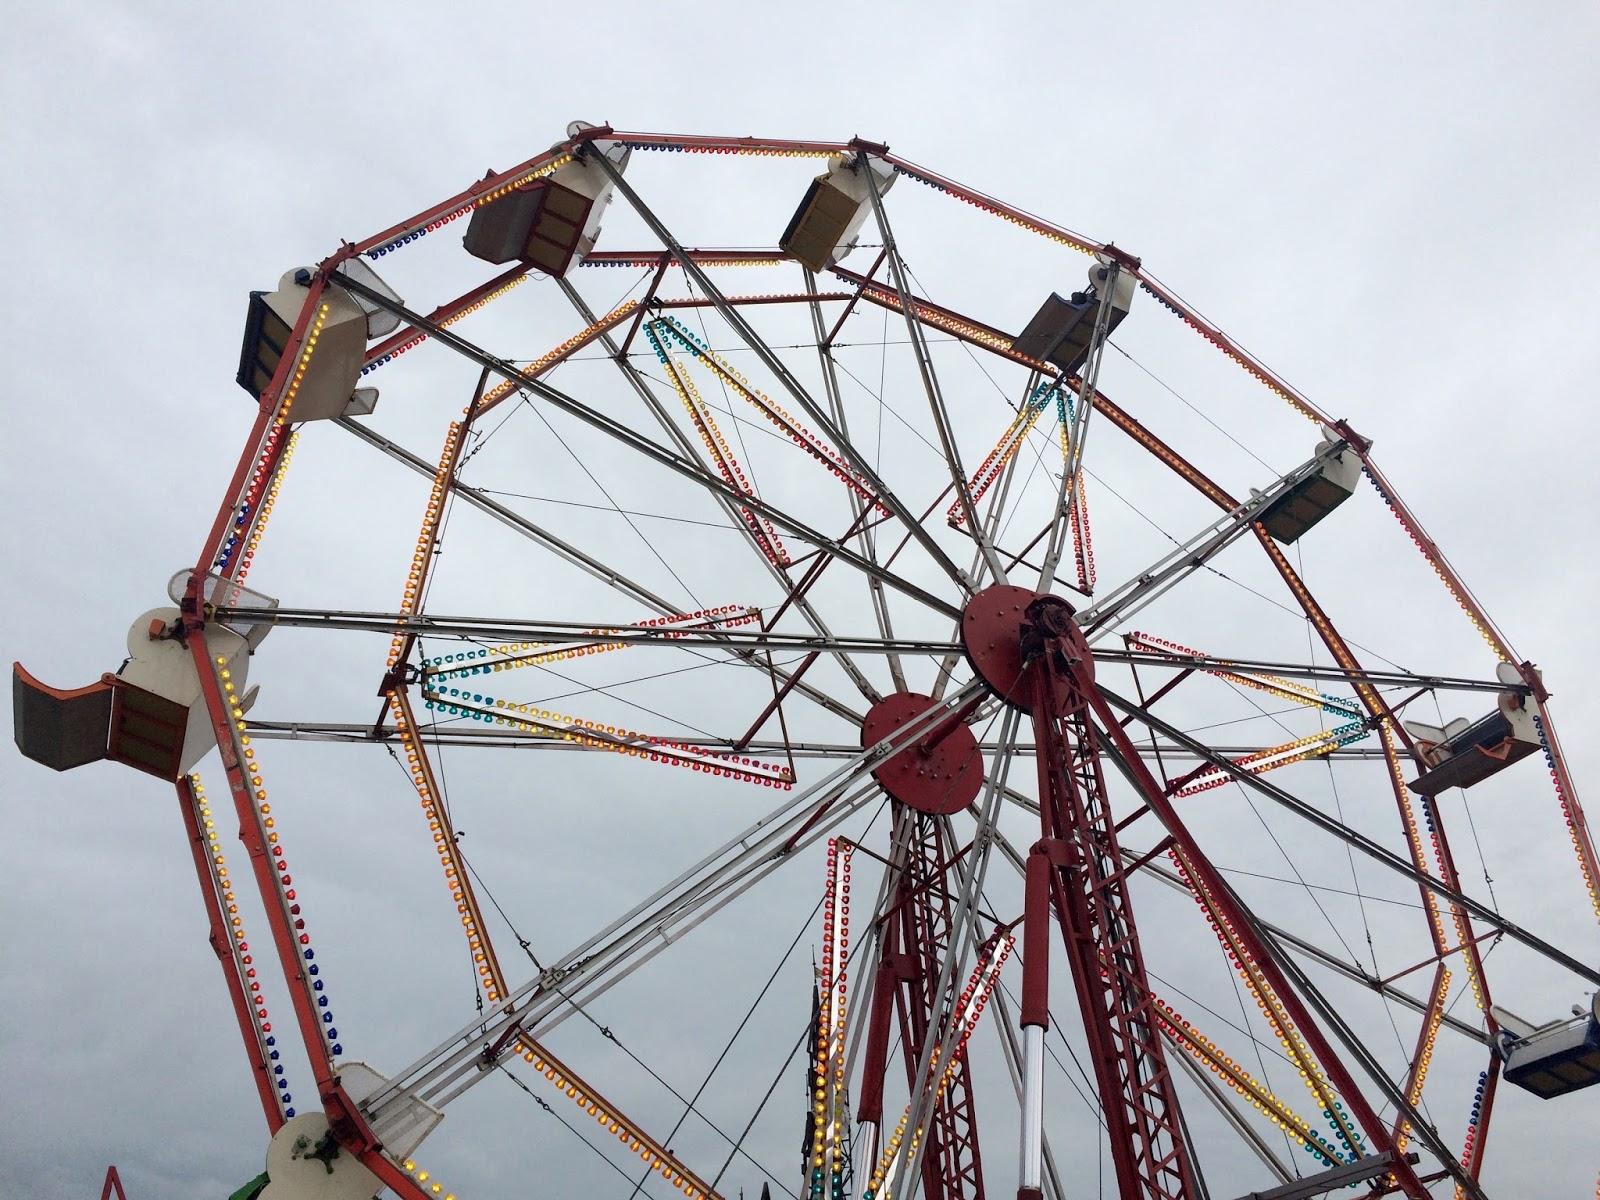 Baknsy Dismaland Ferris Wheel